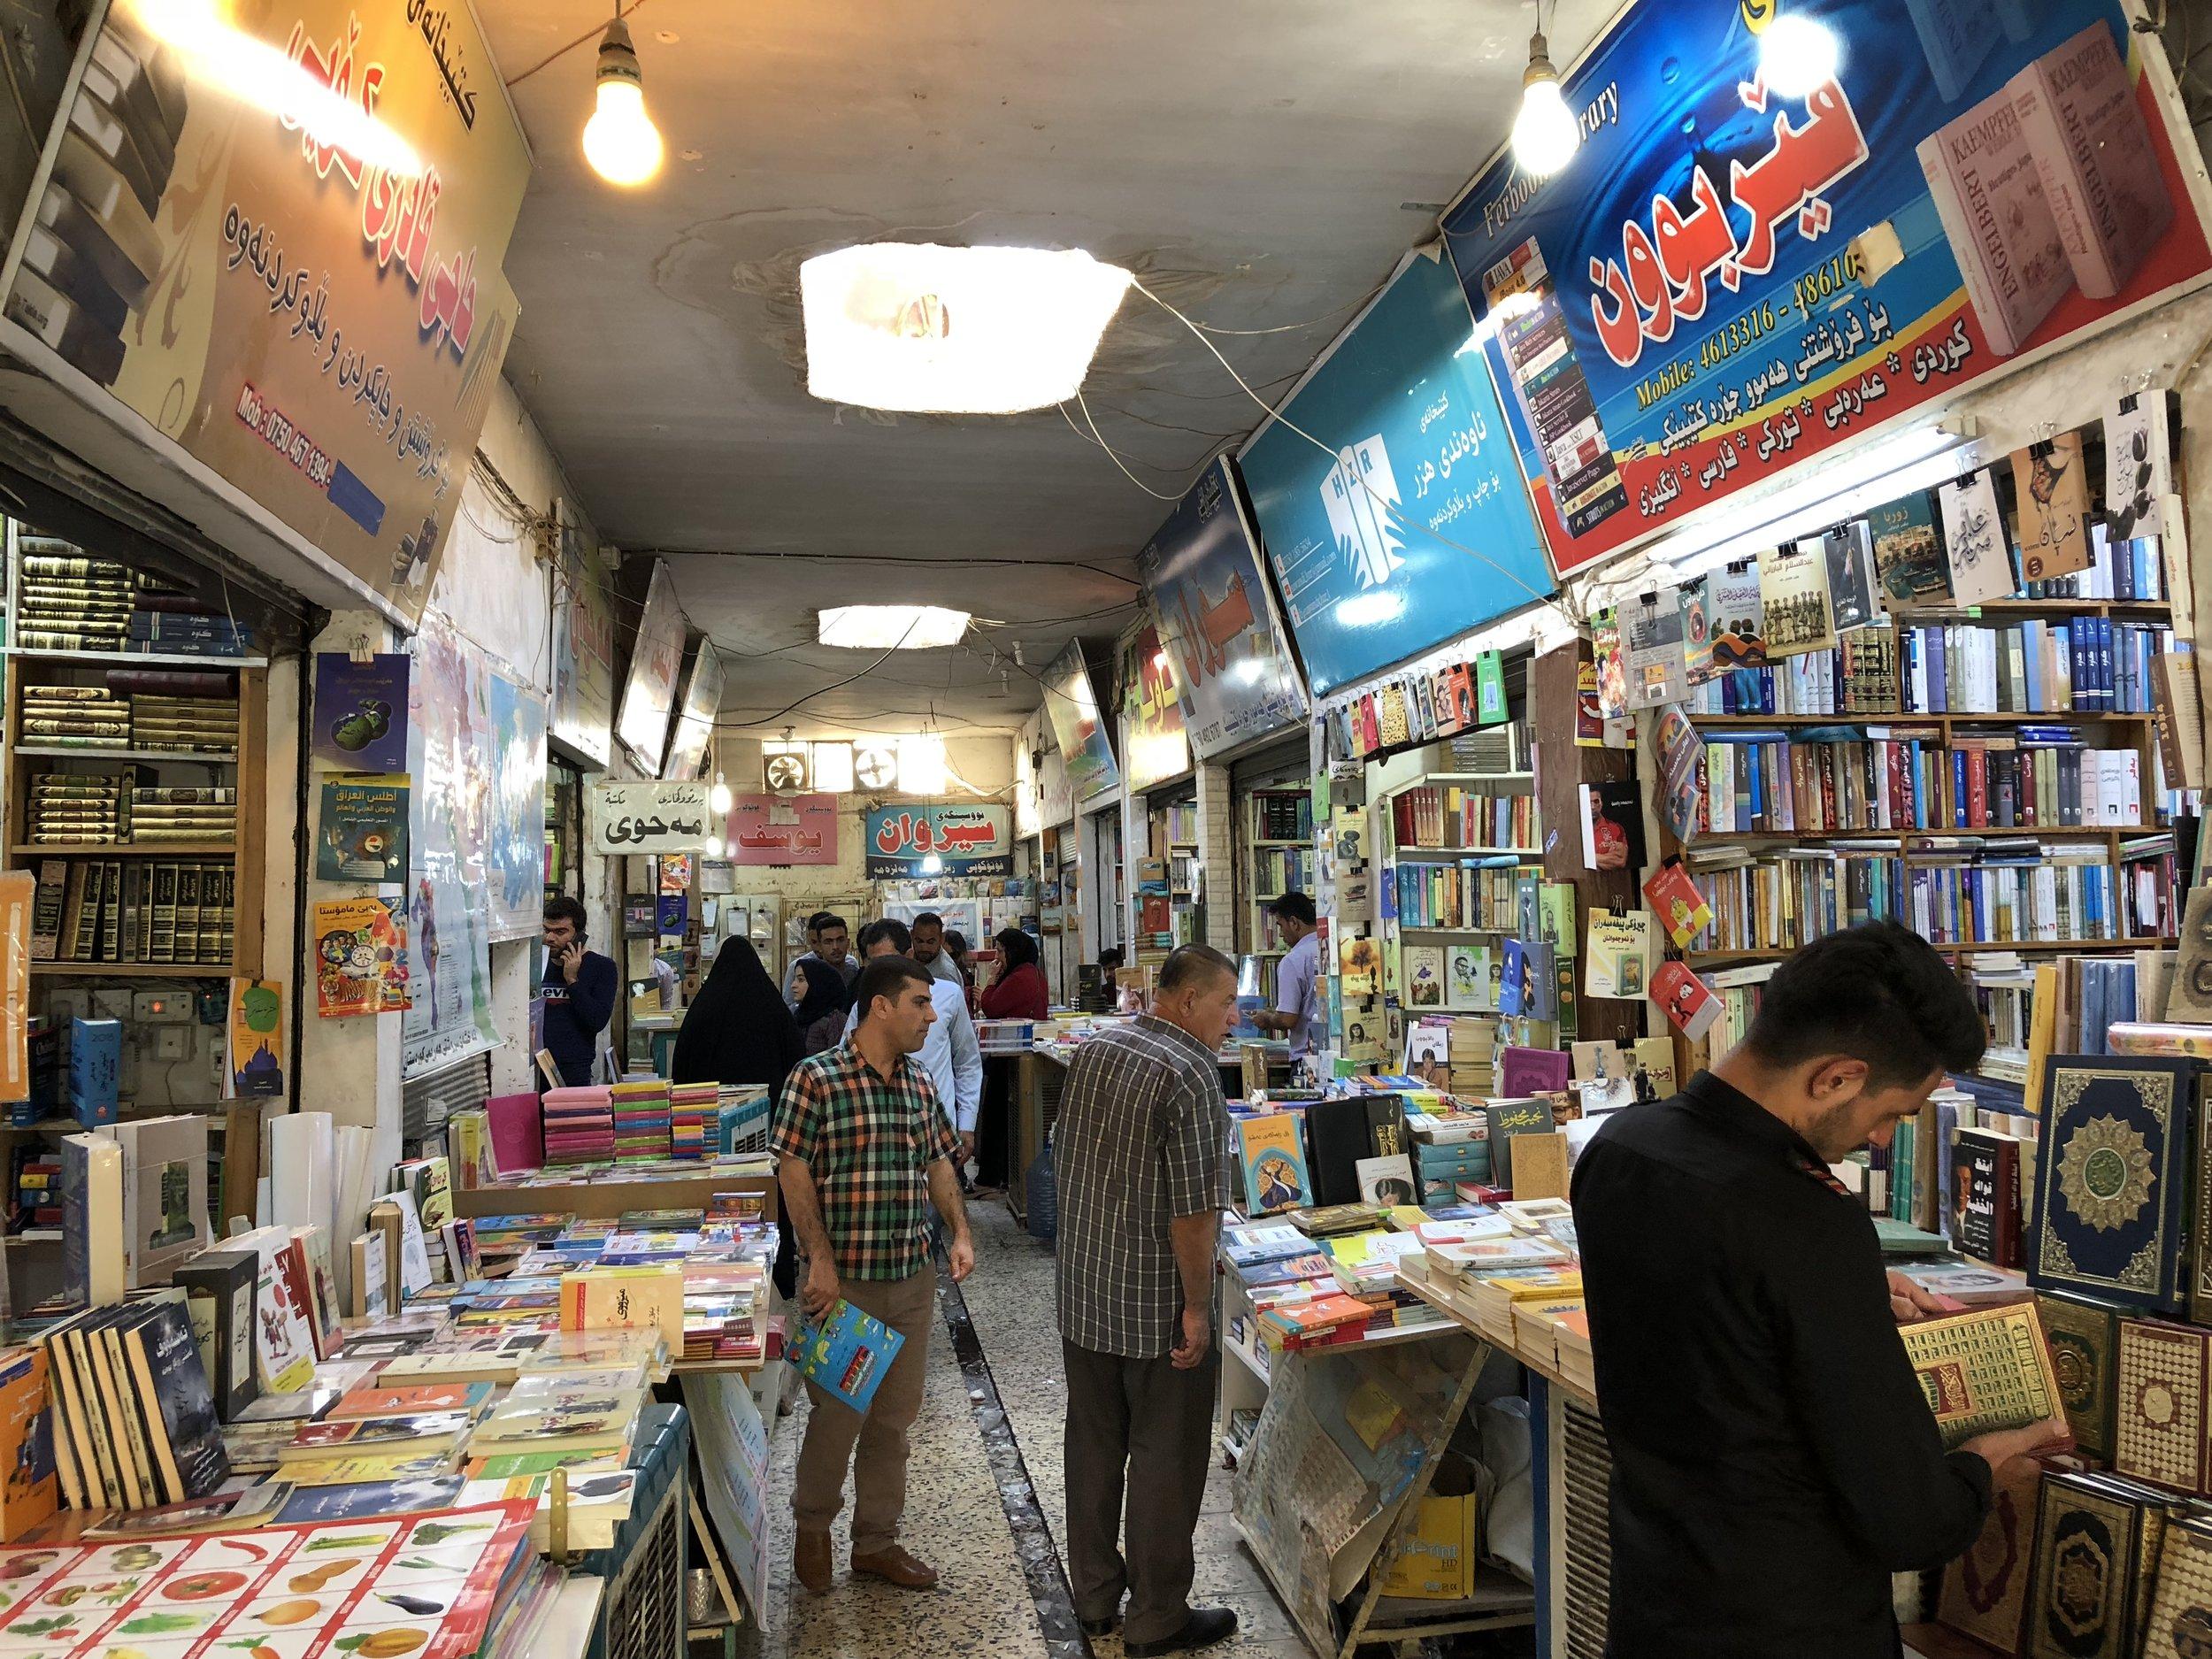 Book bazaar in Erbil